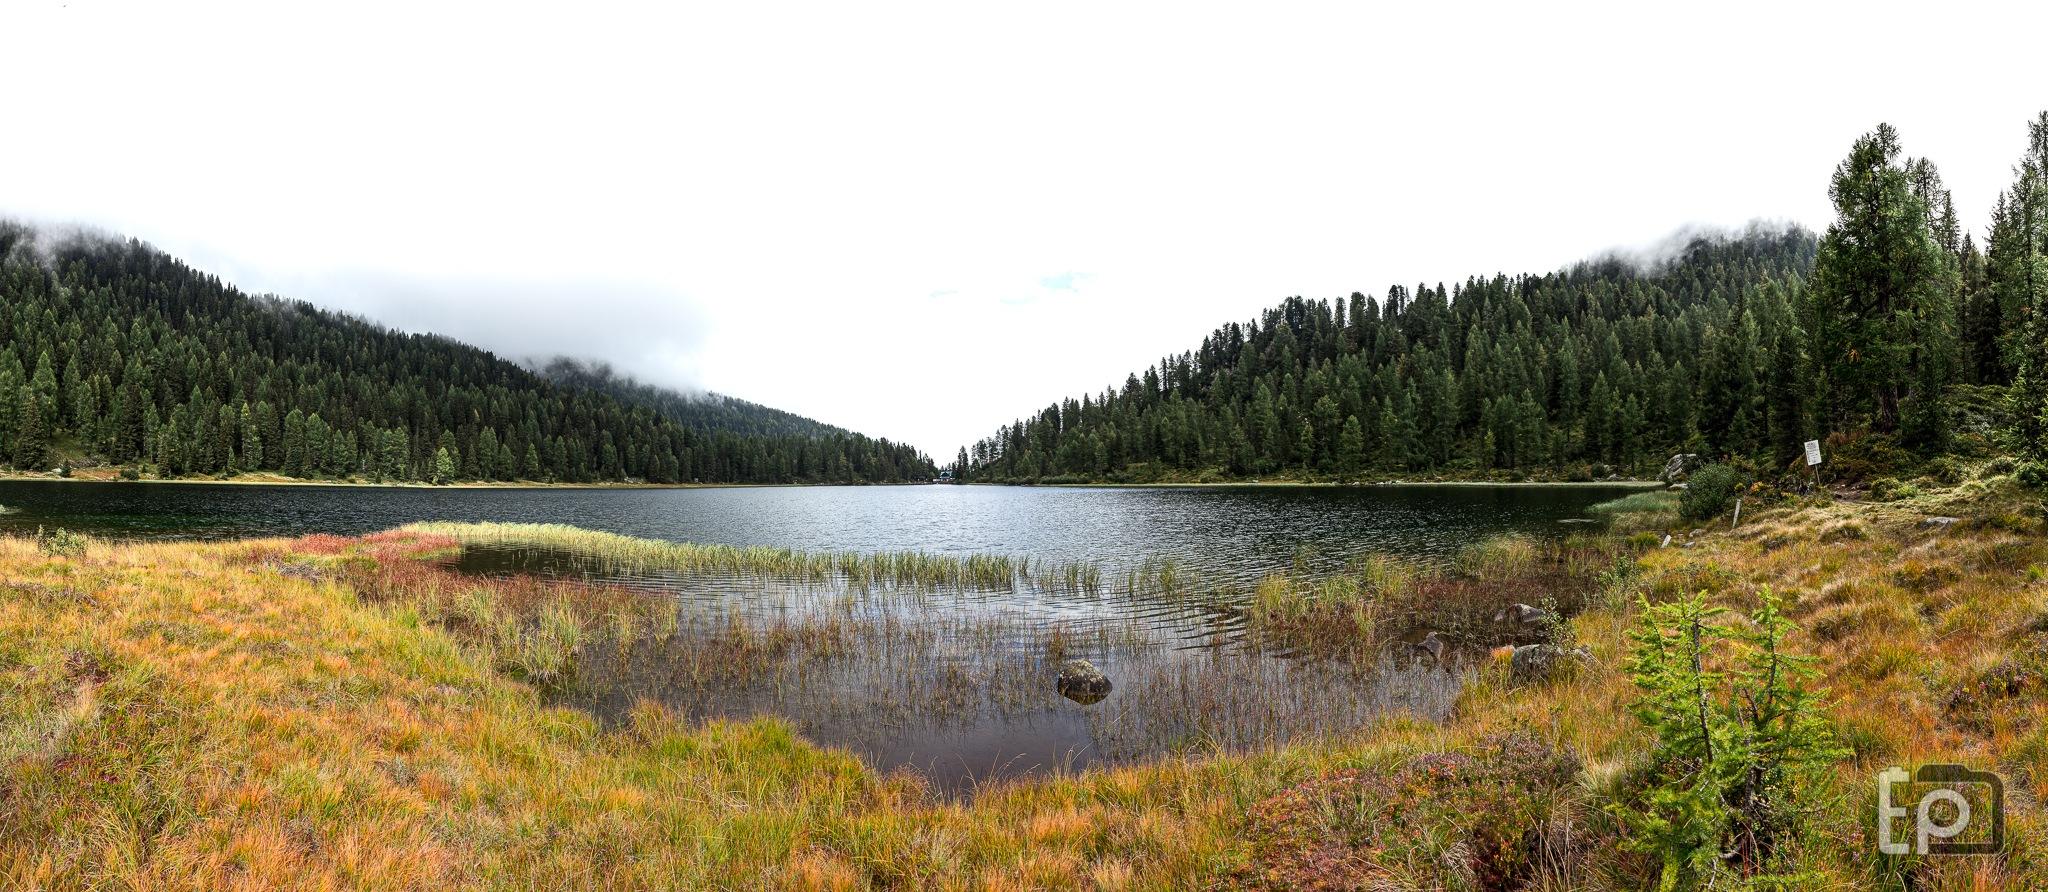 Lago delle malghette - Lake of little mountain cottage - Italy by Enrico Pretto